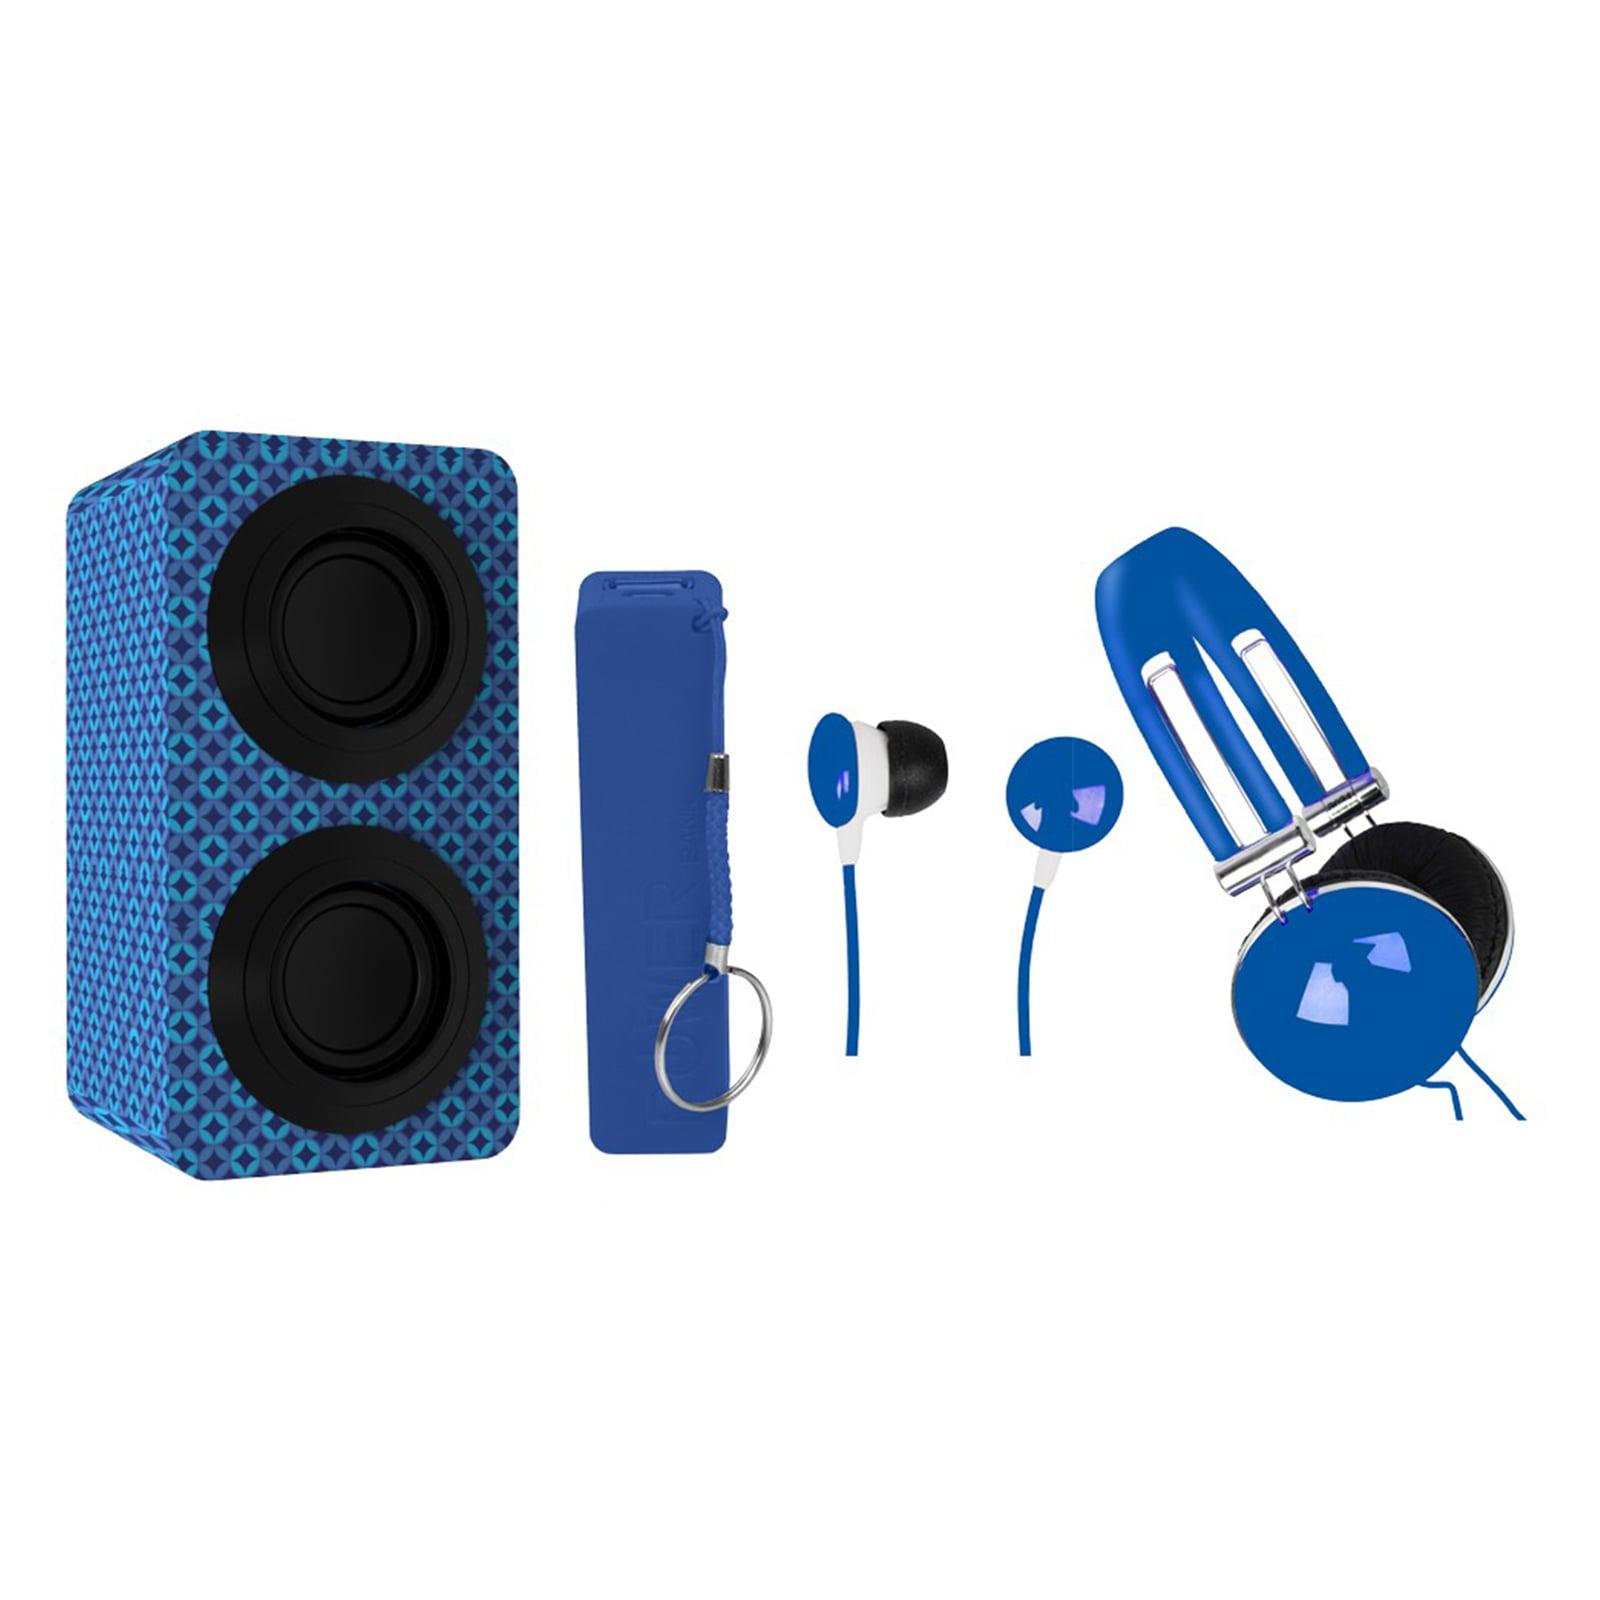 Portable BT Stereo Speakers Entertainment Pack-BLUE